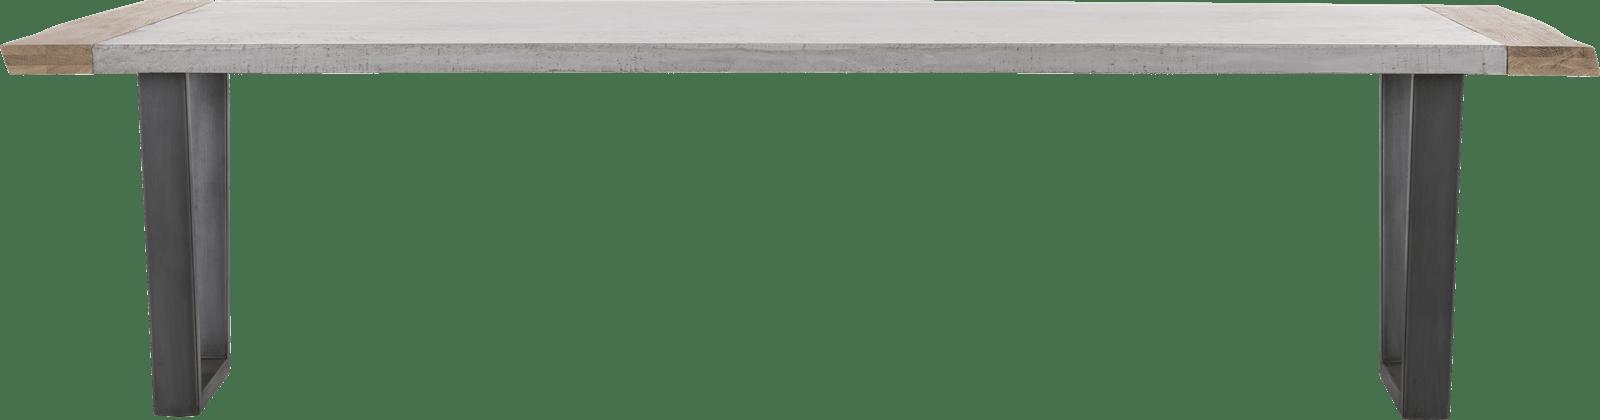 Farmer - eetkamertafel 270 x 100 cm